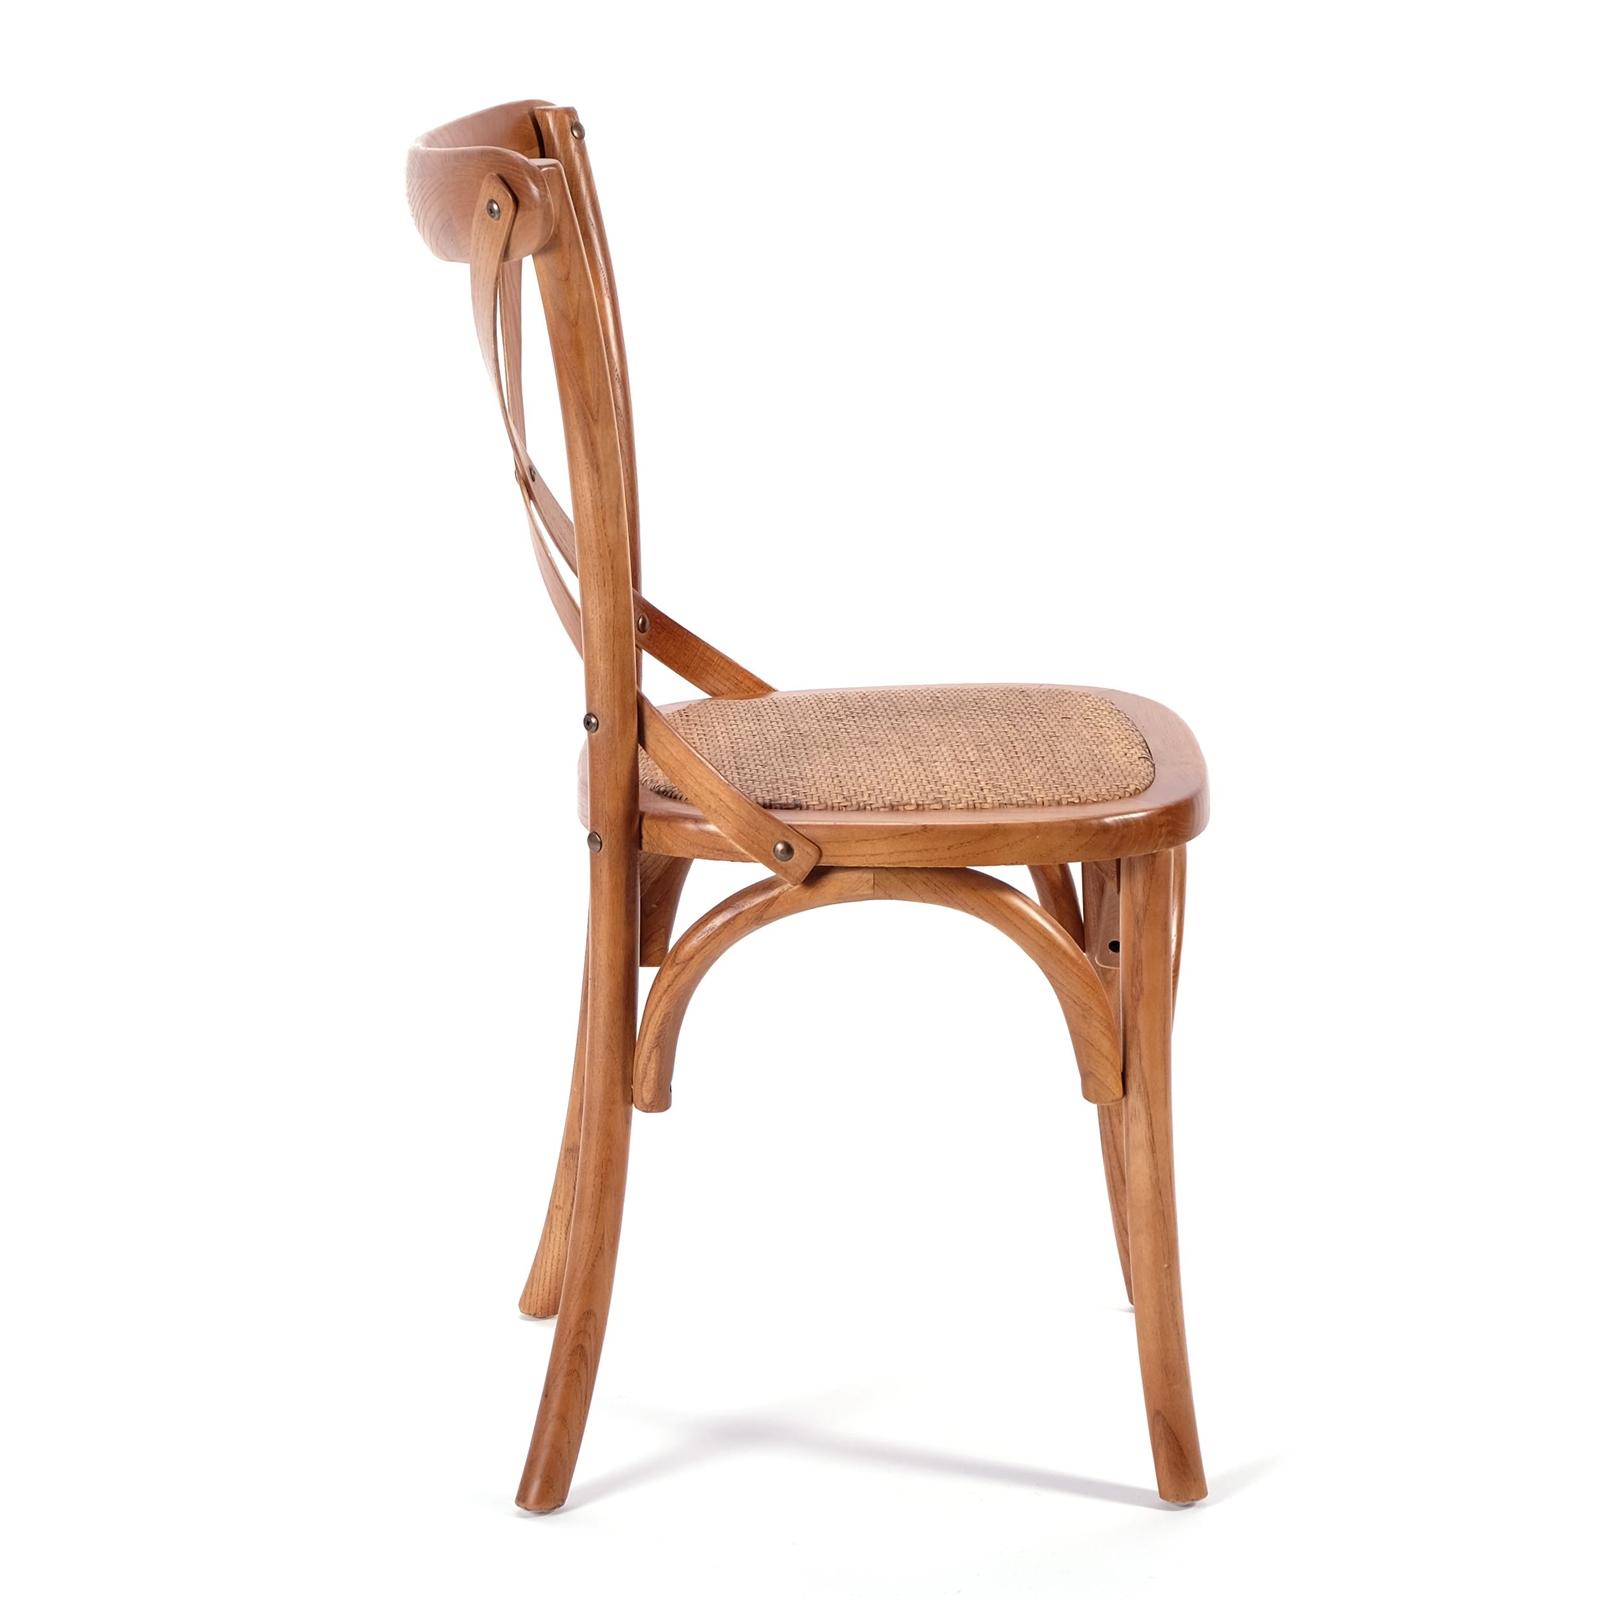 design esszimmerstuhl kolonial holz dunkelbraun rattan holzstuhl ebay. Black Bedroom Furniture Sets. Home Design Ideas